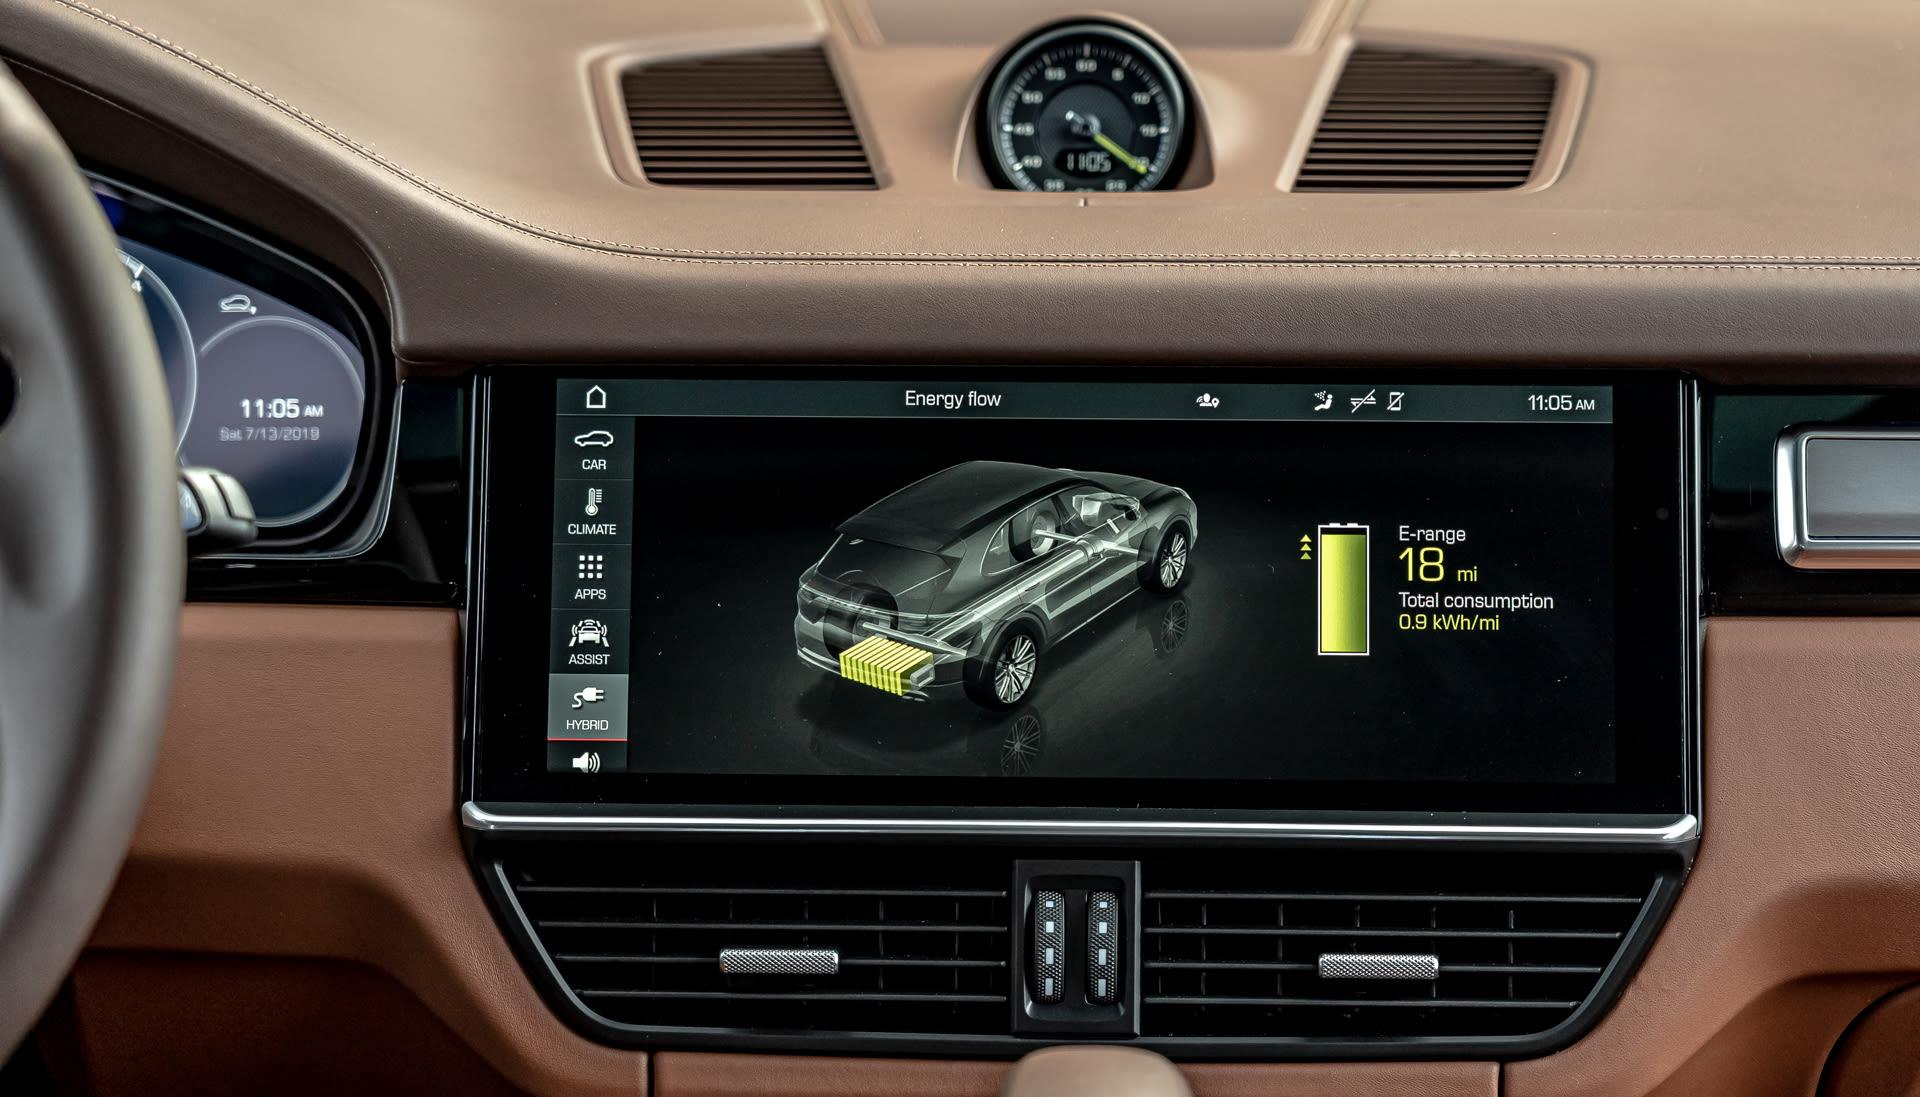 2020 Cayenne Turbo S E-Hybrid first drive